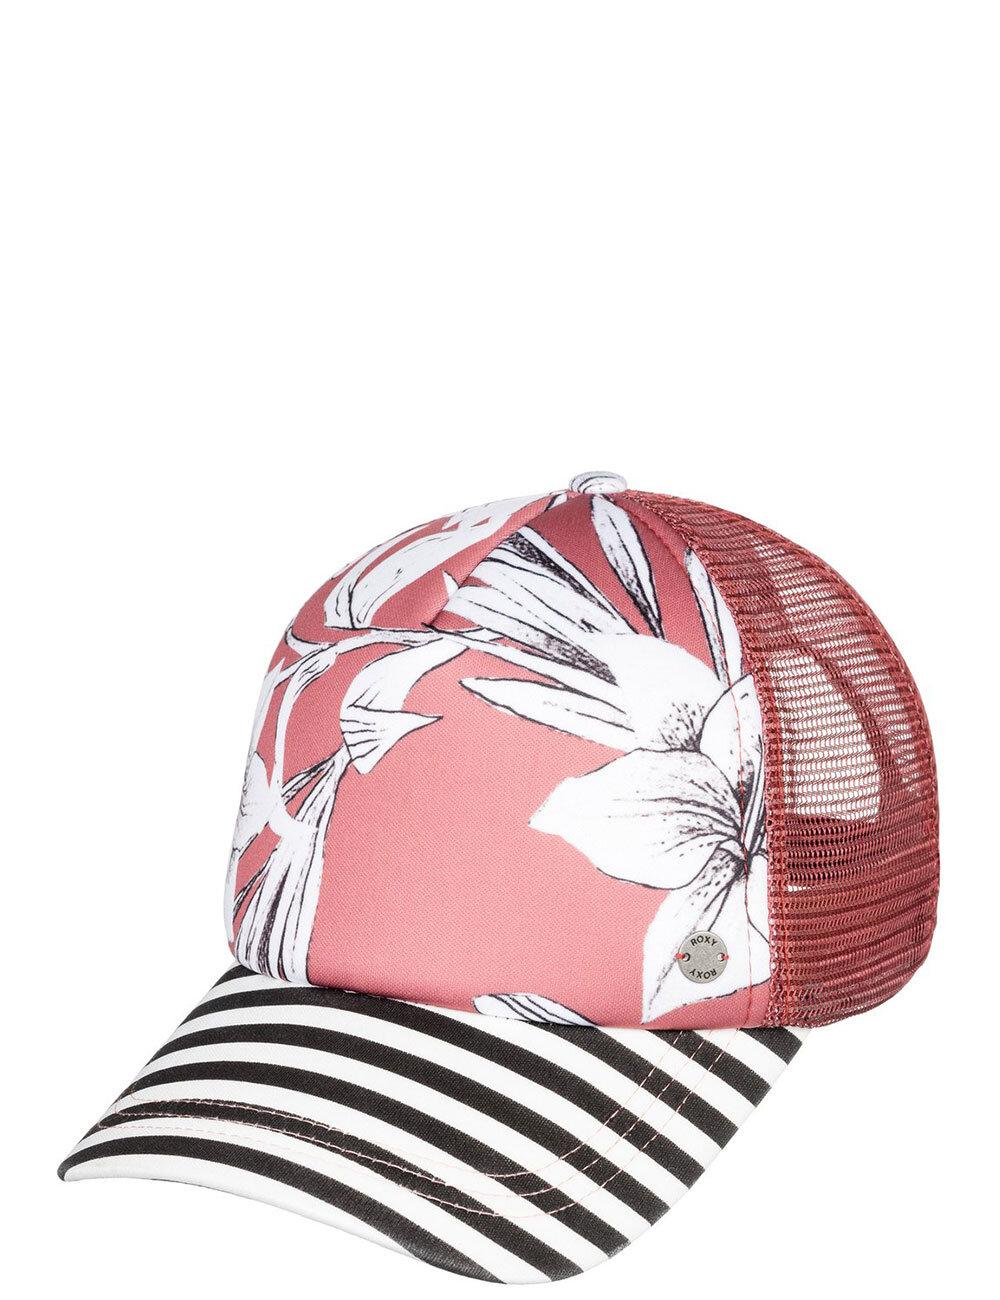 e510236a102 WATER COME DOWN CAP - ROSE LILY - Women s Accessories